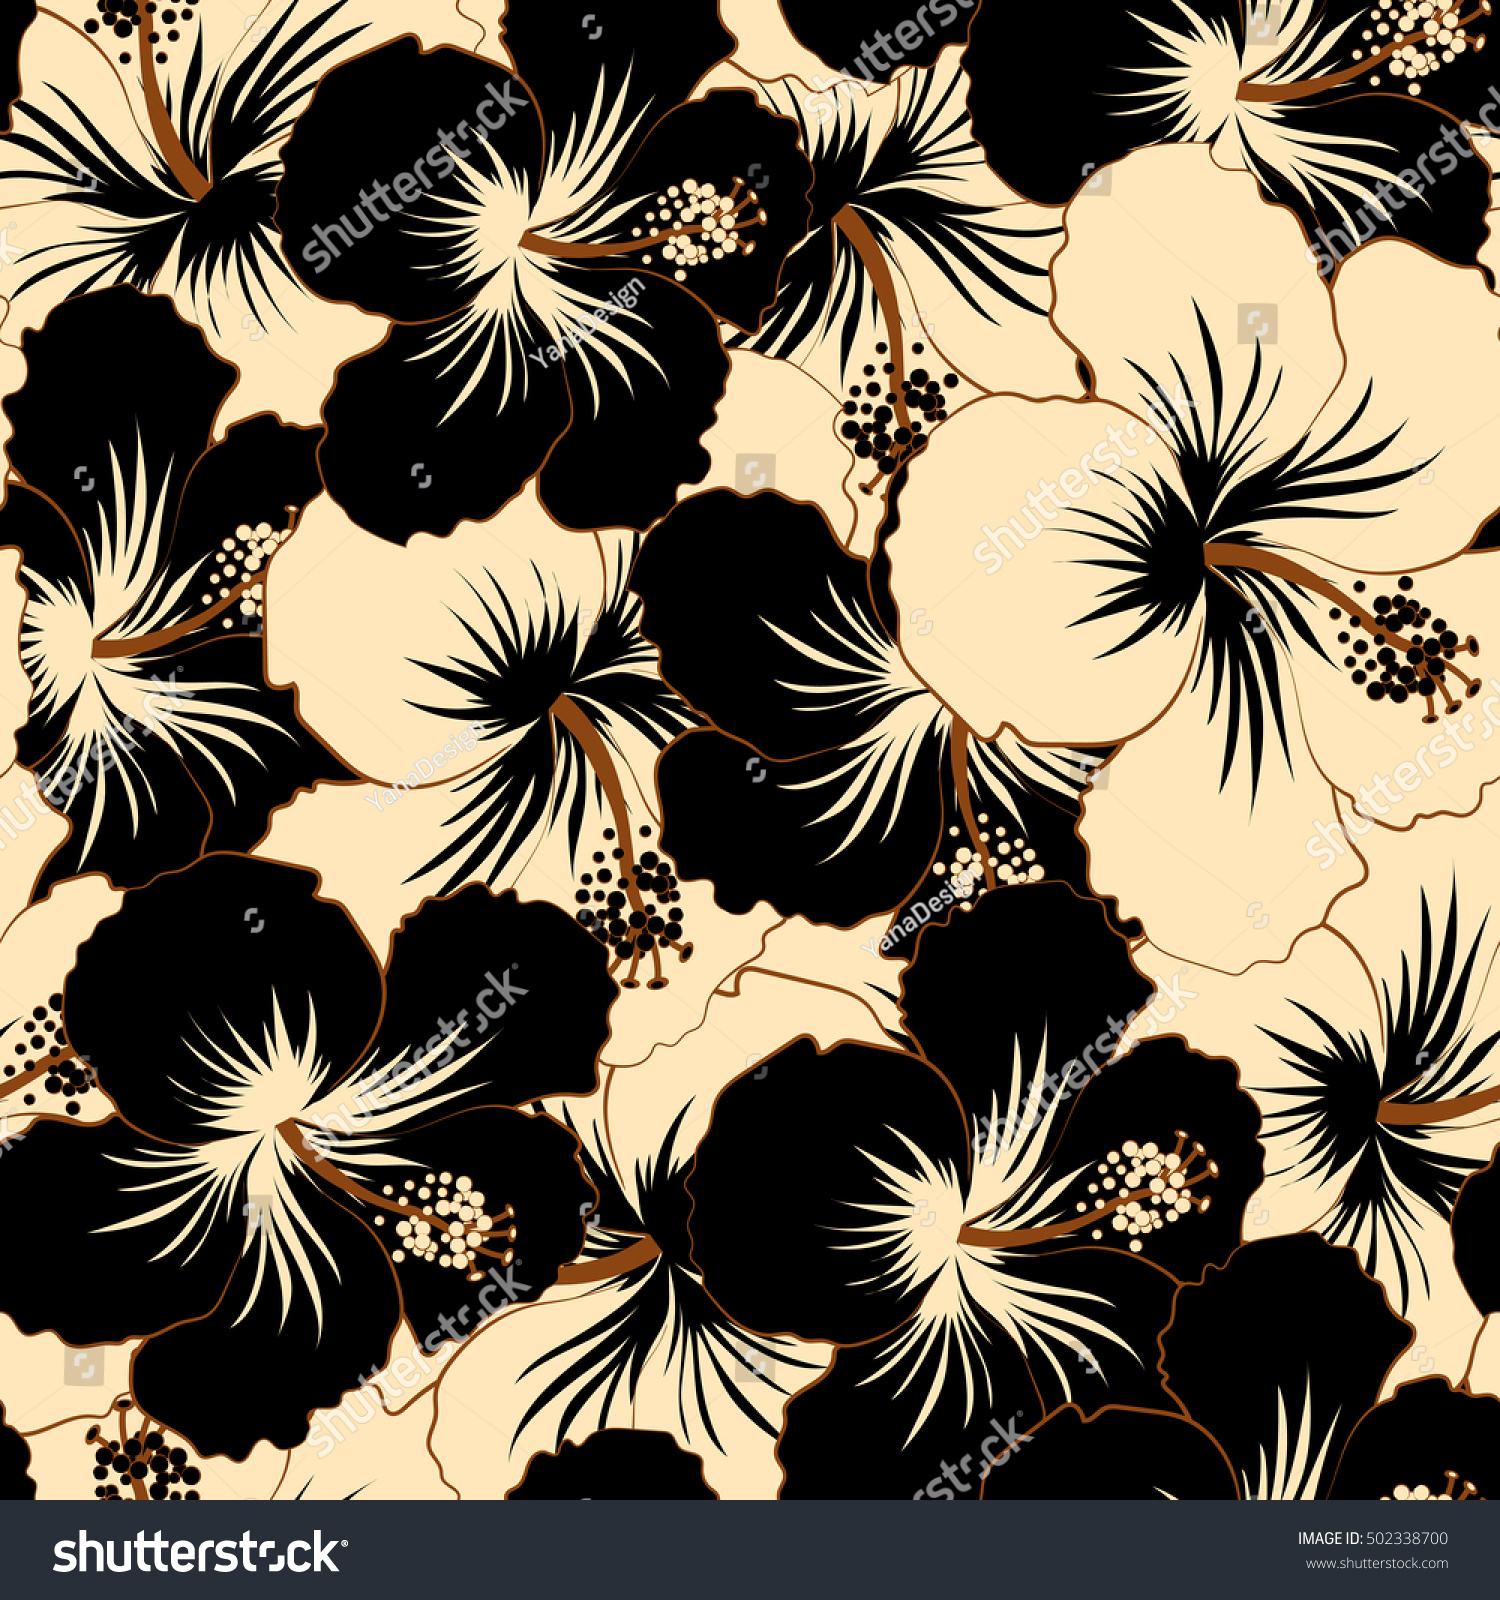 Beige black ornament simple hibiscus flowers stock illustration beige and black ornament of simple hibiscus flowers abstract seamless pattern for design and textile izmirmasajfo